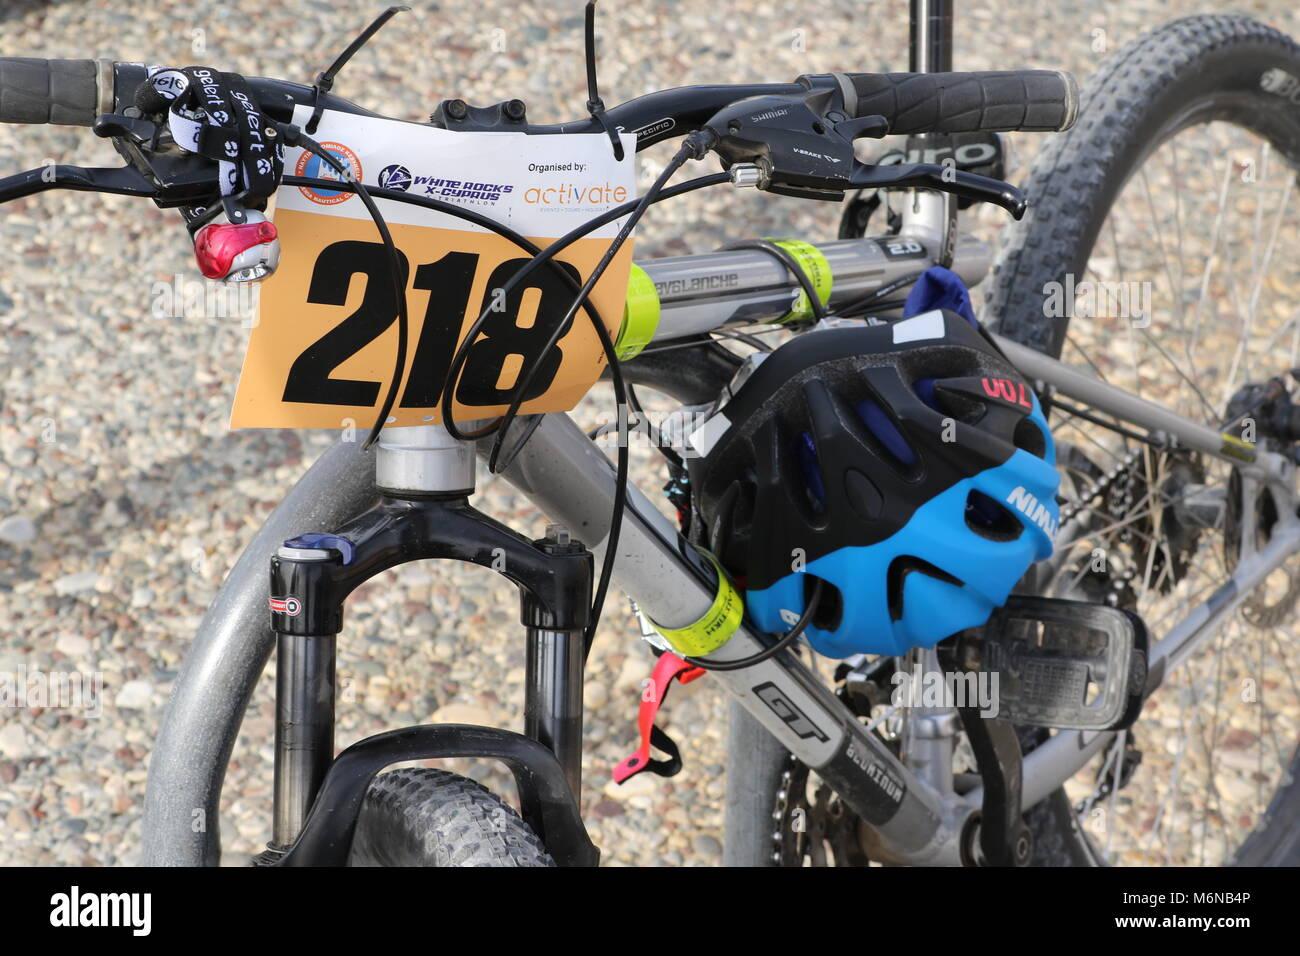 Bike with runners number and blue helmet at the 20th Logicom Cyprus marathon, half marathon, 10KM, 5KM (04/03/2018), - Stock Image